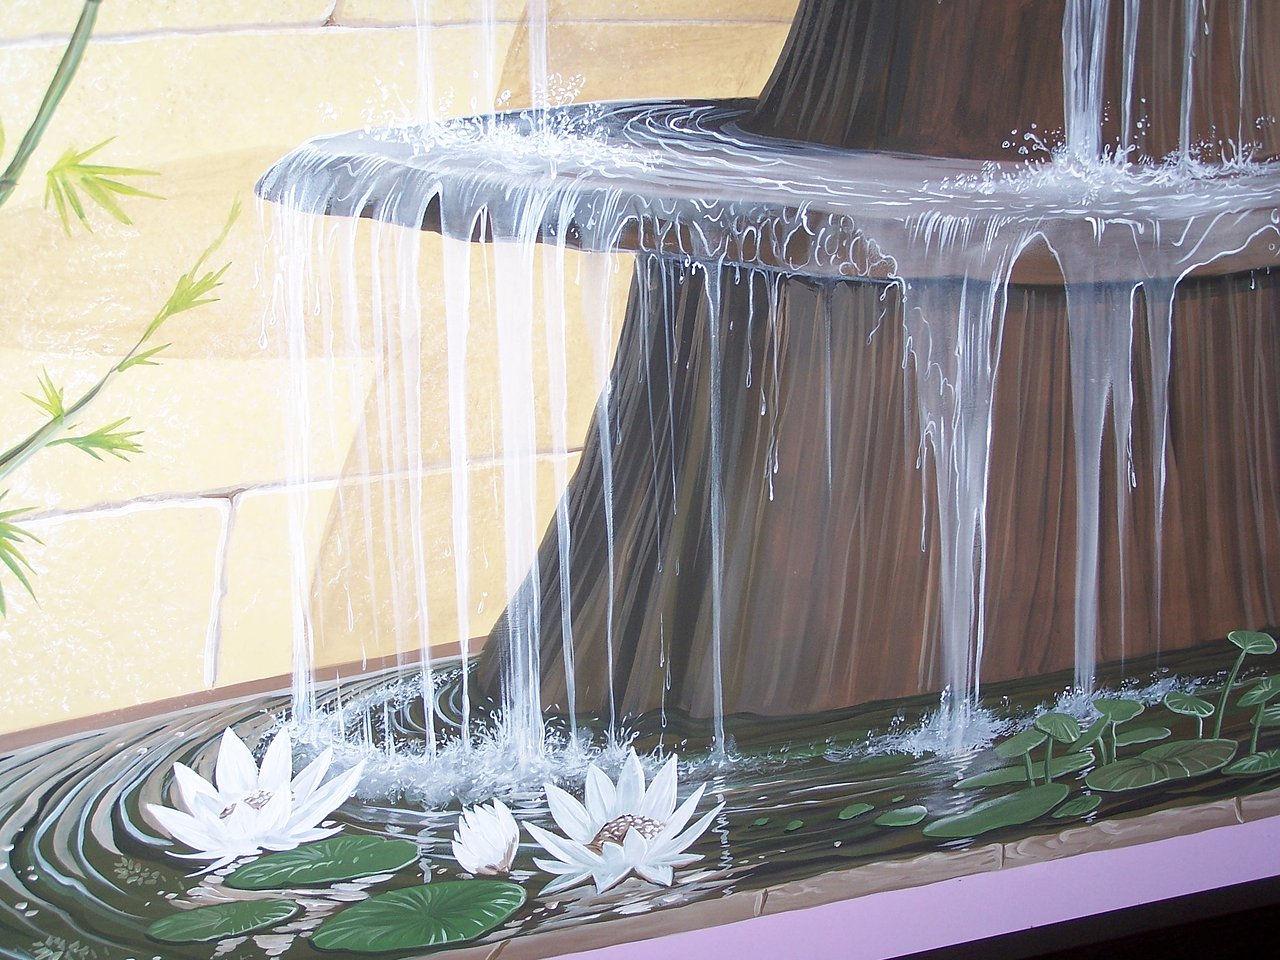 Emp arstudium enrico maria pucci annicco cremona for Fontana zen